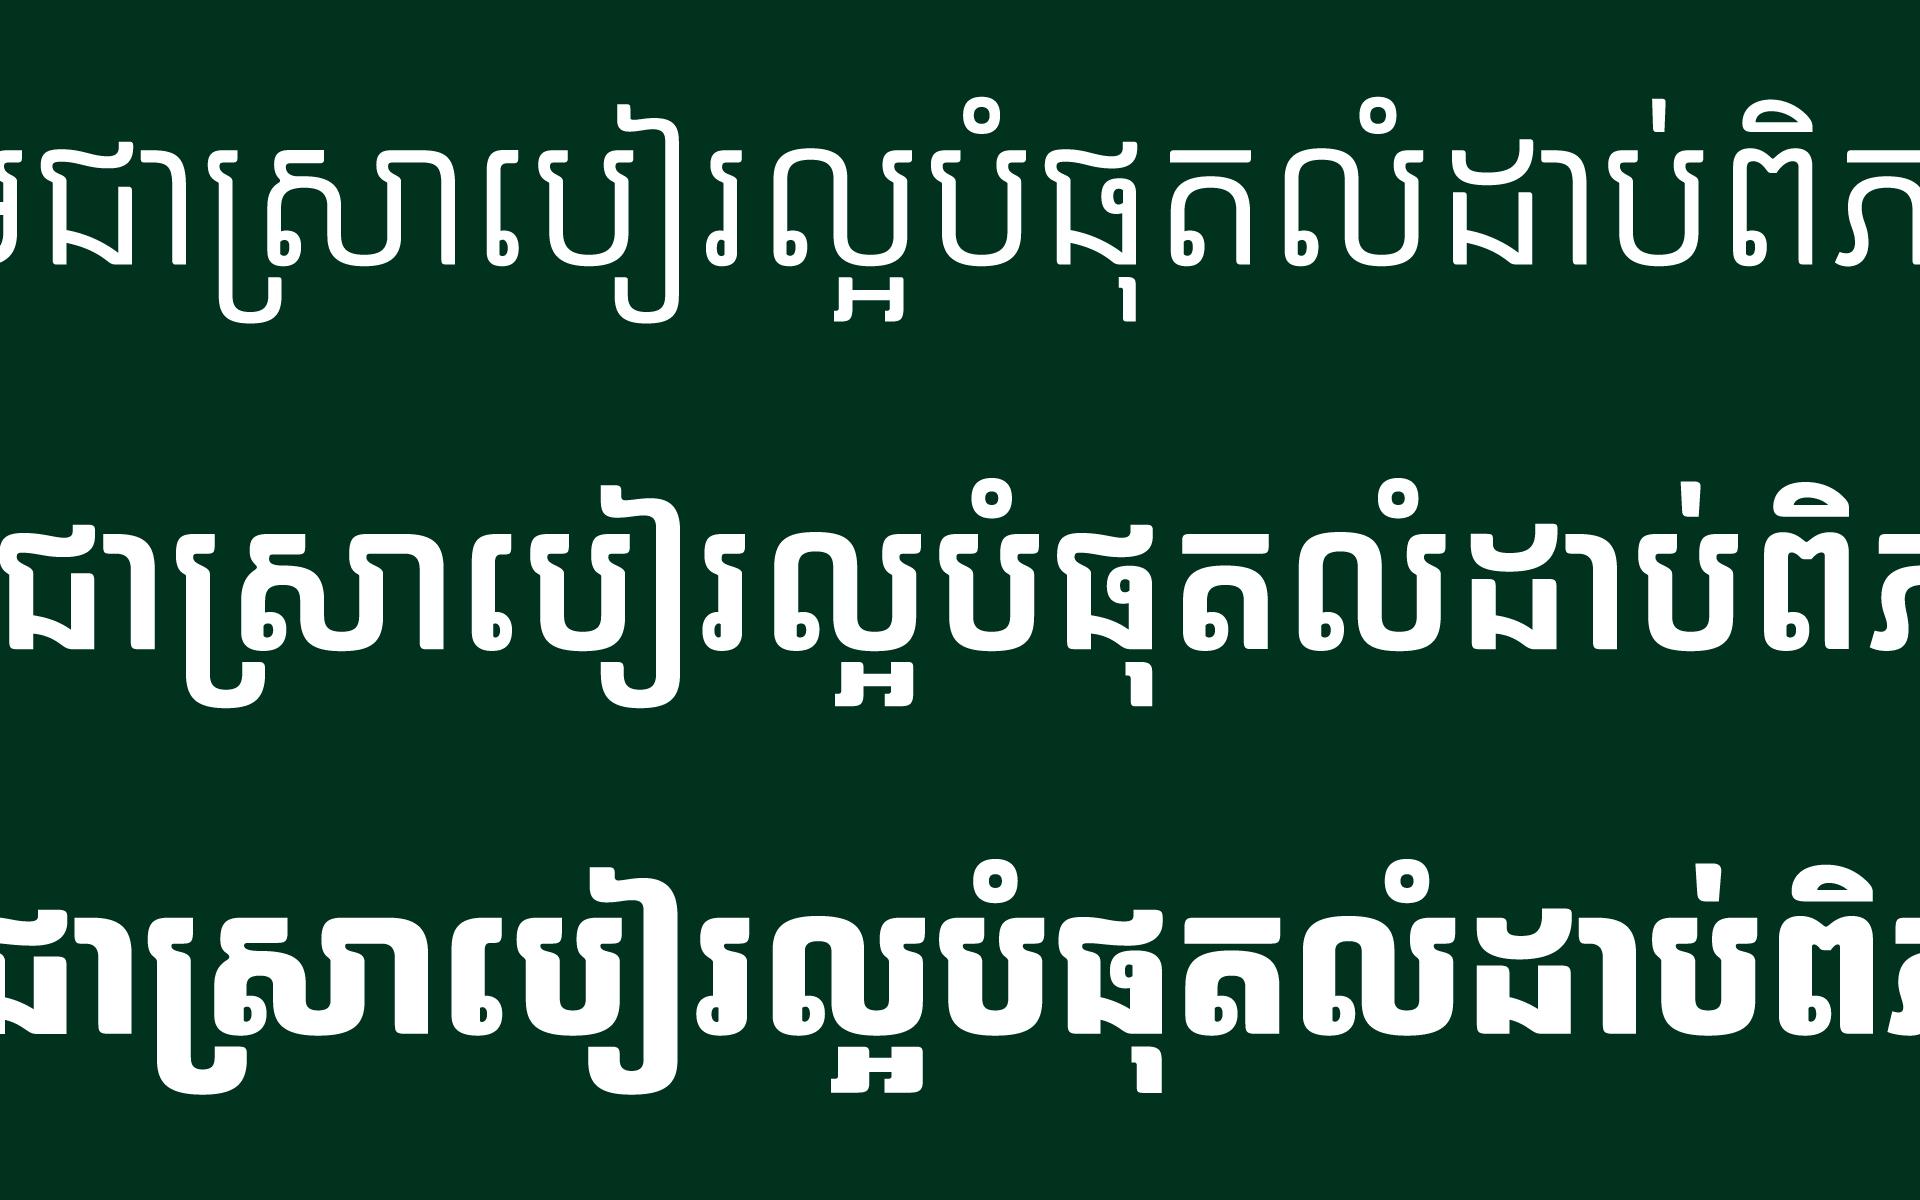 Carlsberg-Sans-Type-Design-14